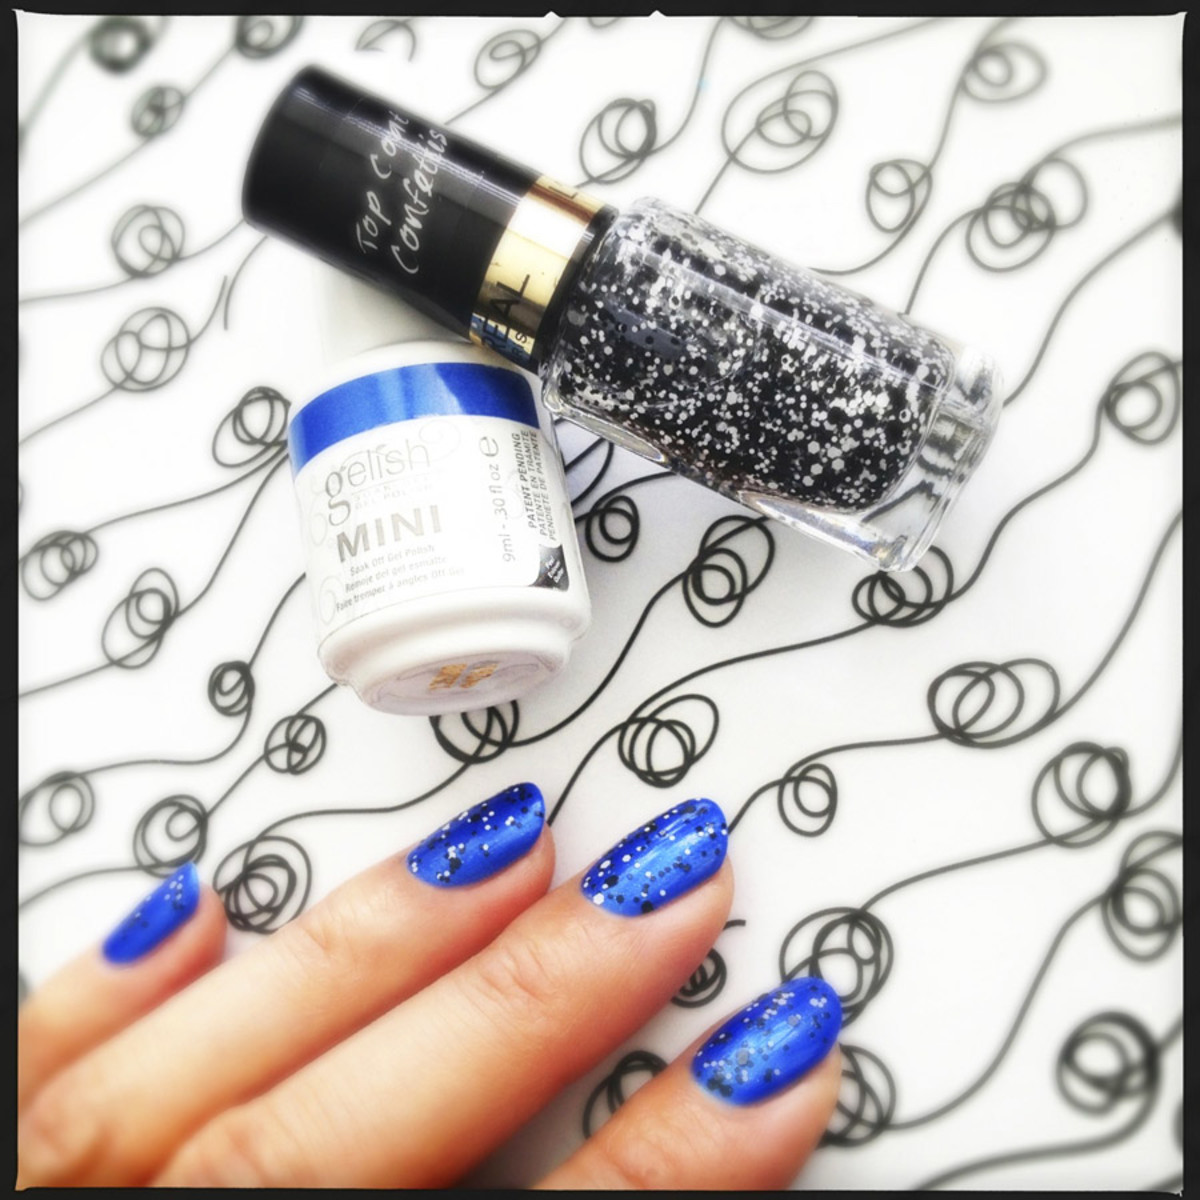 Gelish mini Ocean Wave and L'Oreal Paris Color Riche Top Coat in Confetti aka The Sparklicious